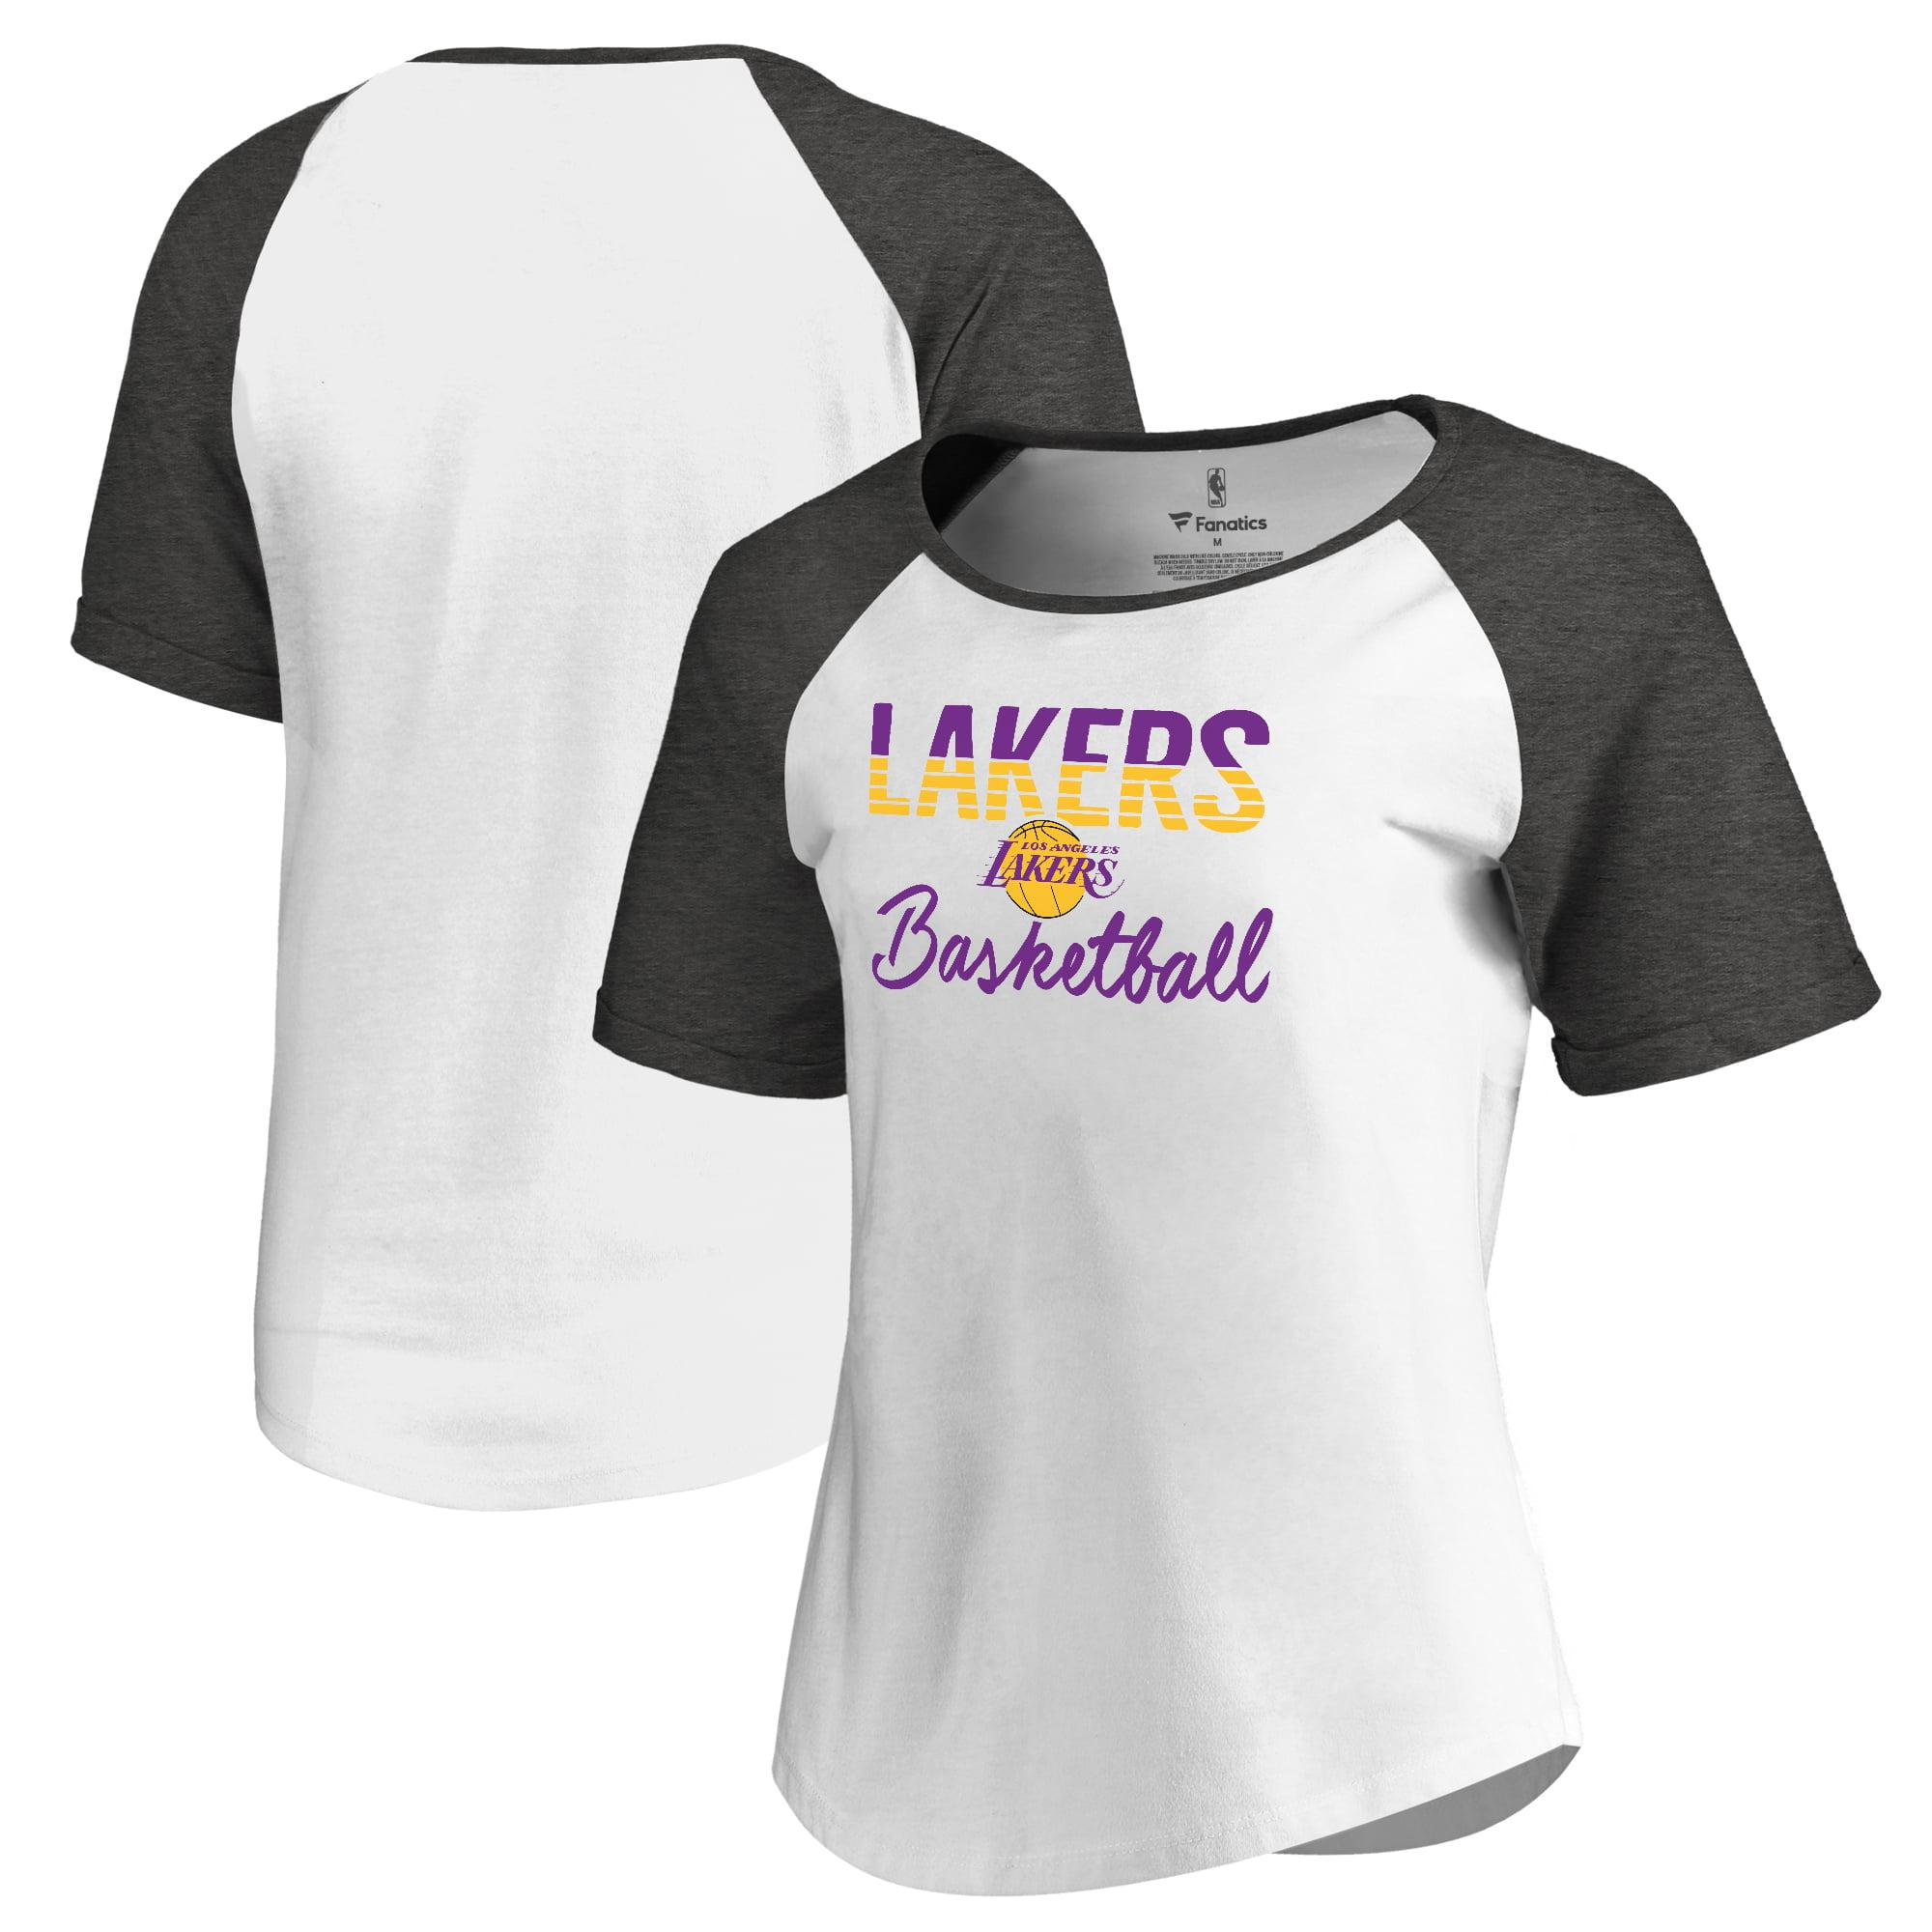 Los Angeles Lakers Fanatics Branded Women's Free Line Raglan Scoop Neck Tri-Blend T-Shirt - White/Black